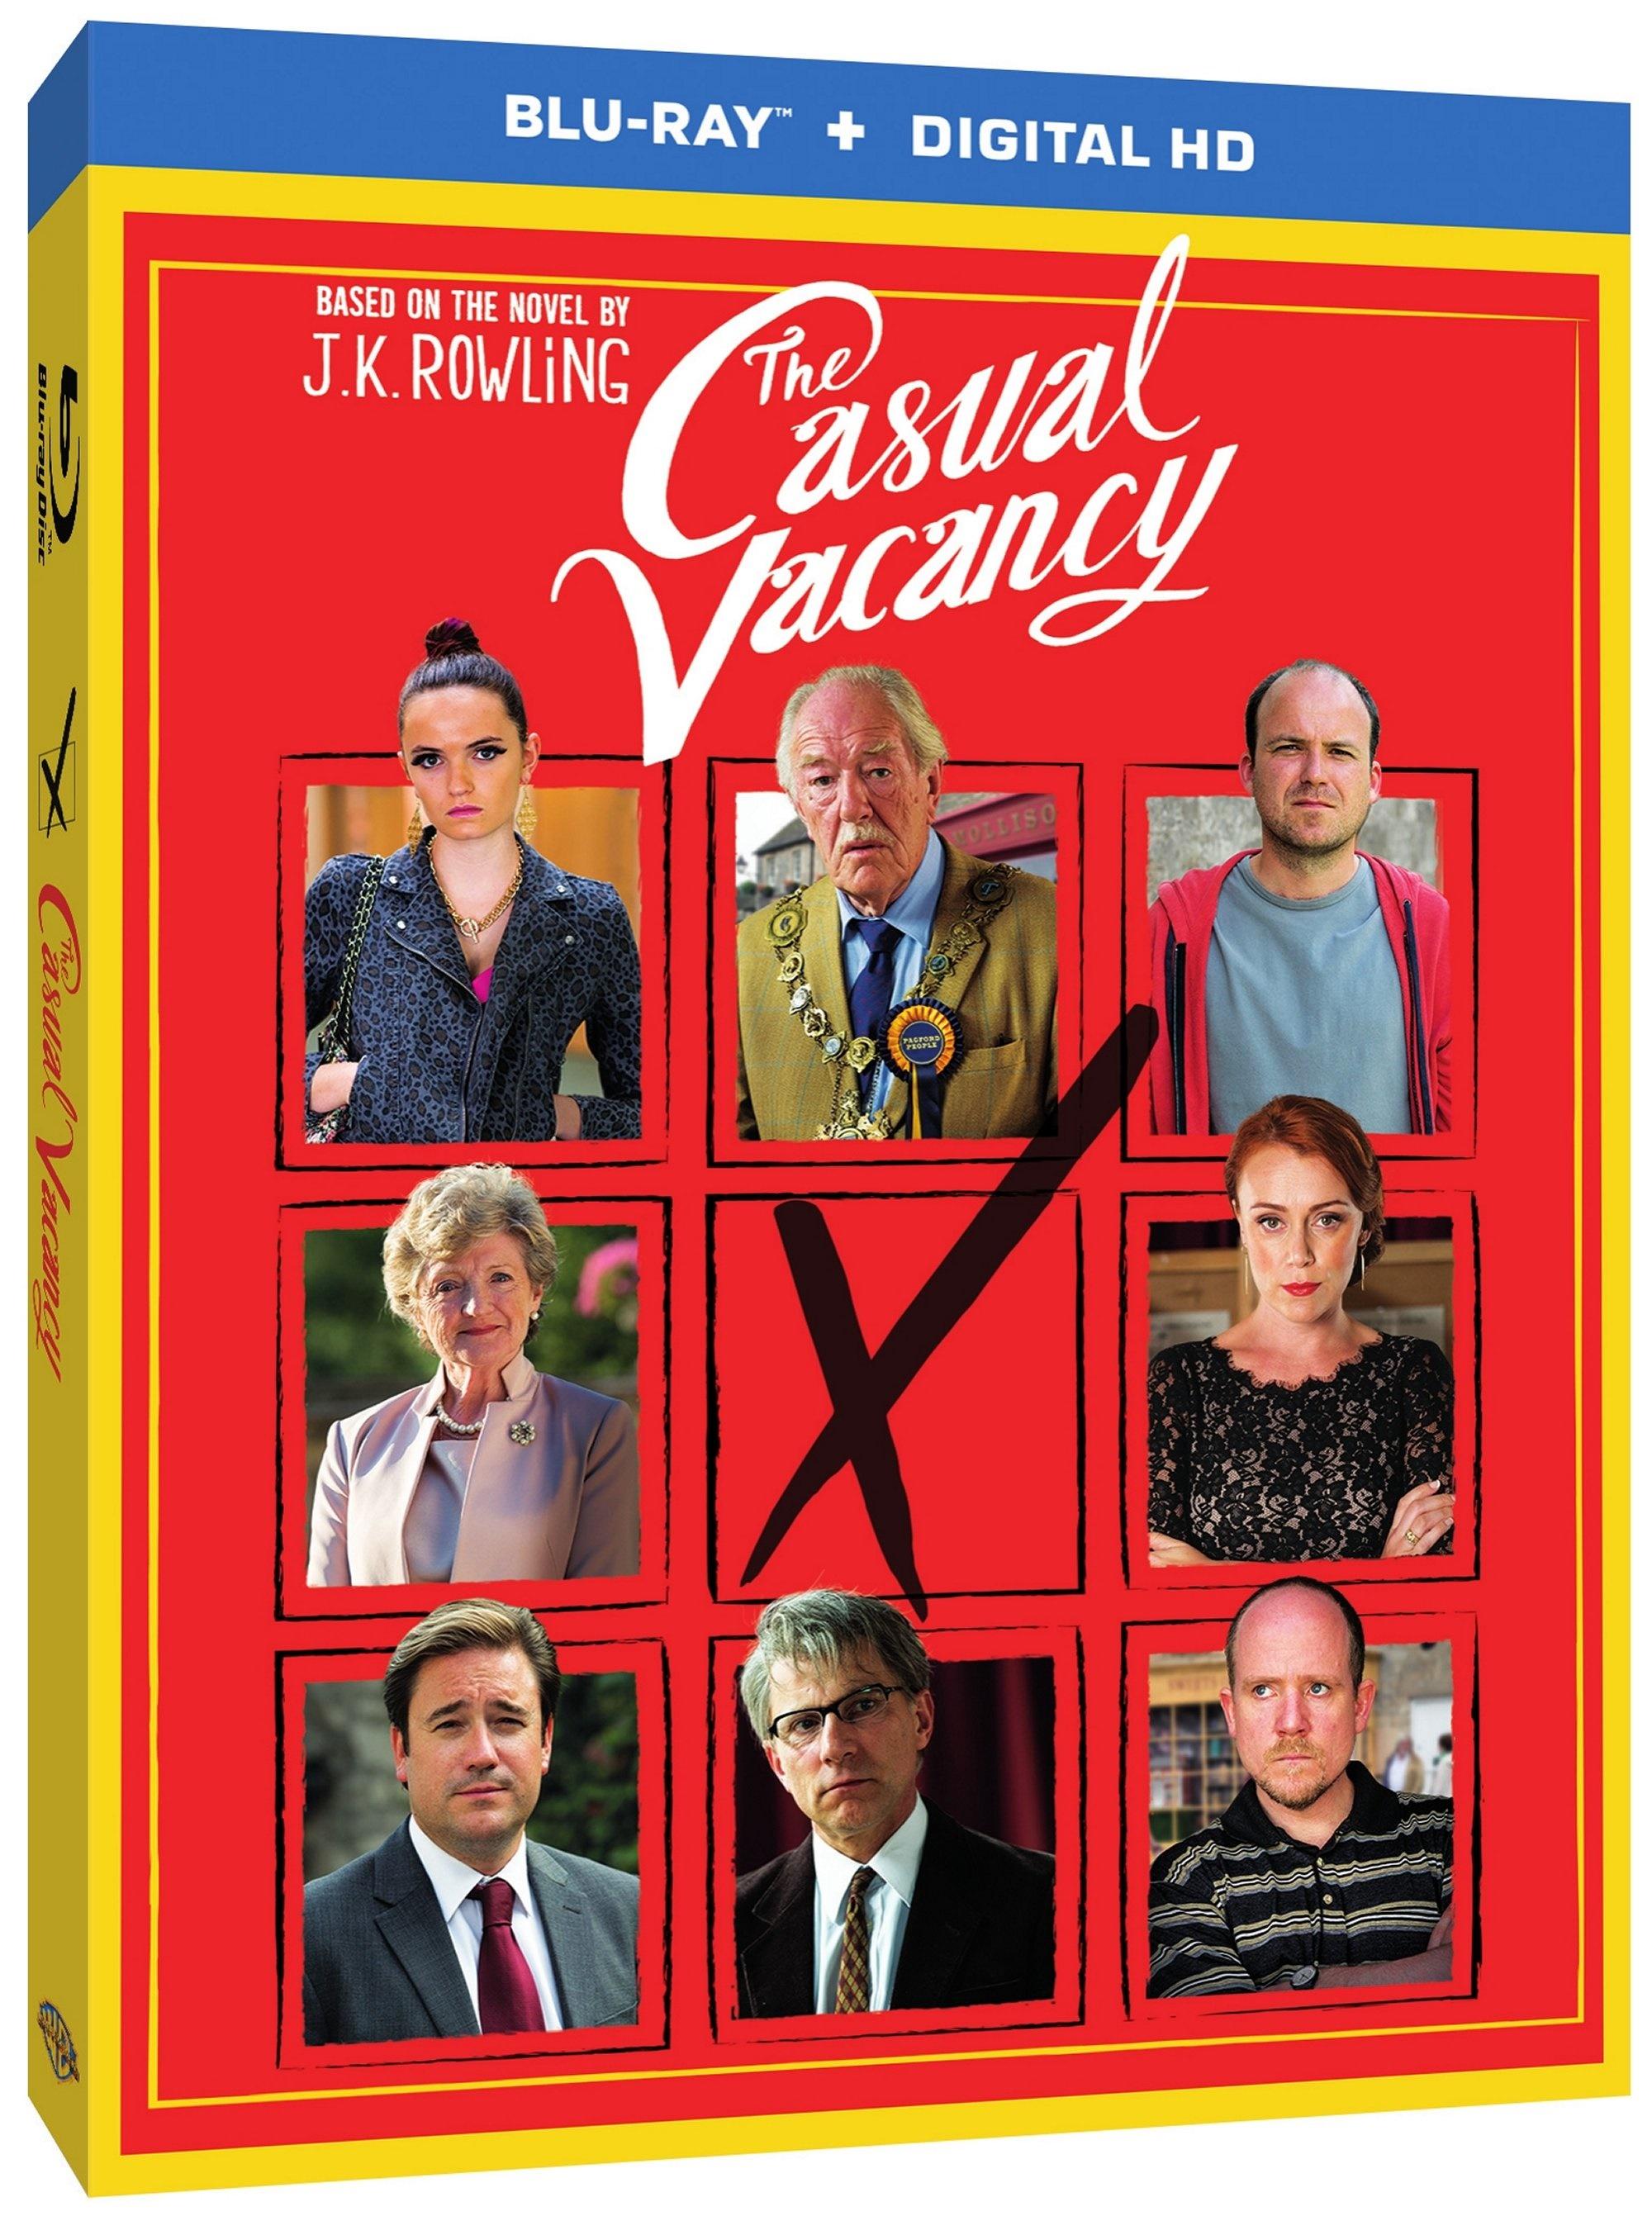 THE CASUAL VACANCY Blu-ray